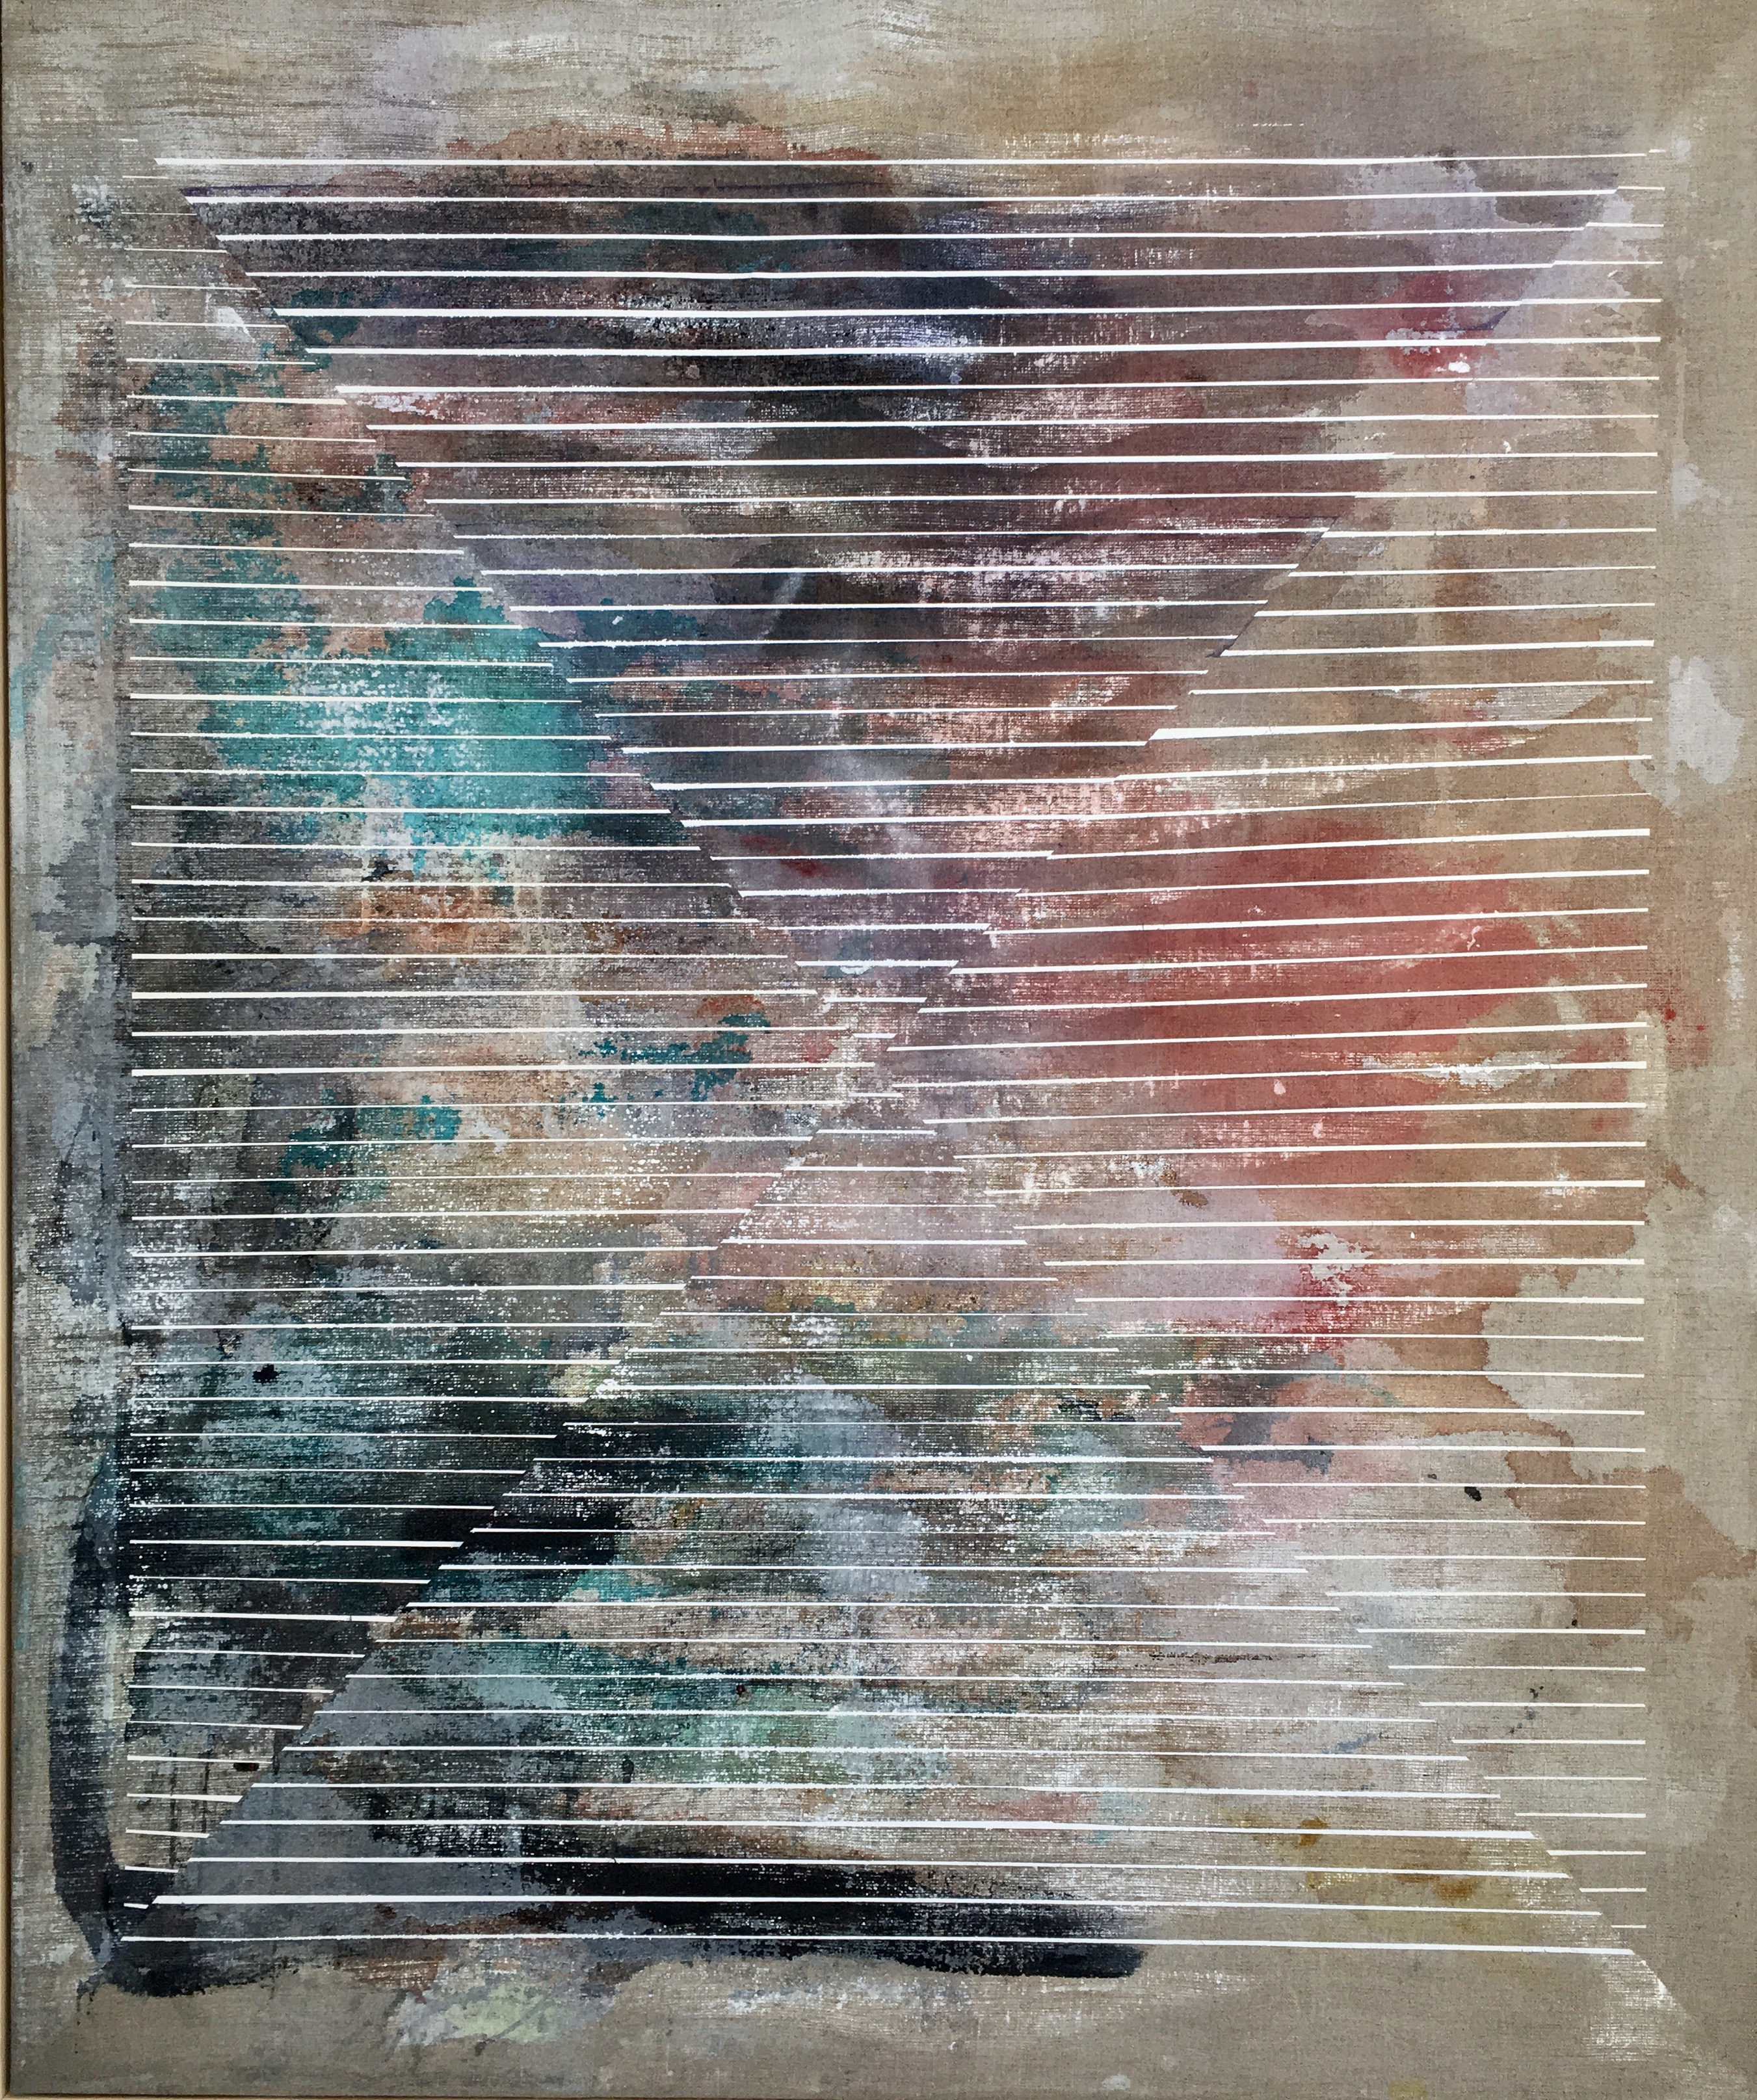 Outline 120 x 100 cm